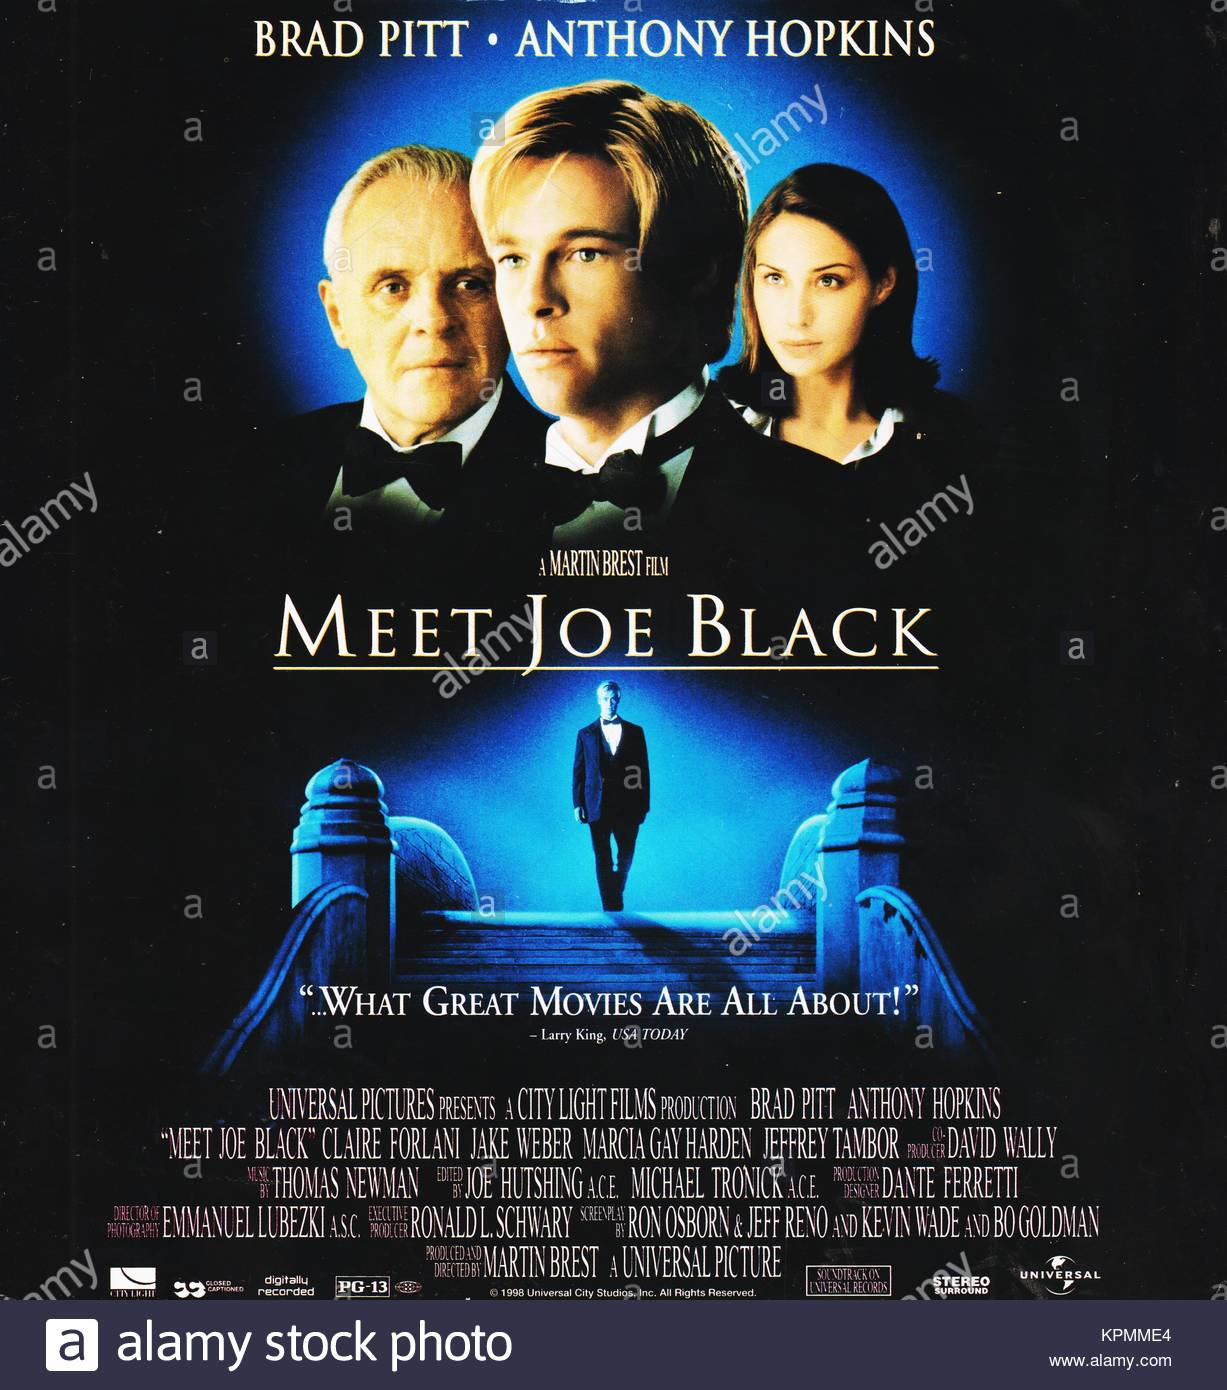 meet joe black death and taxes scenery